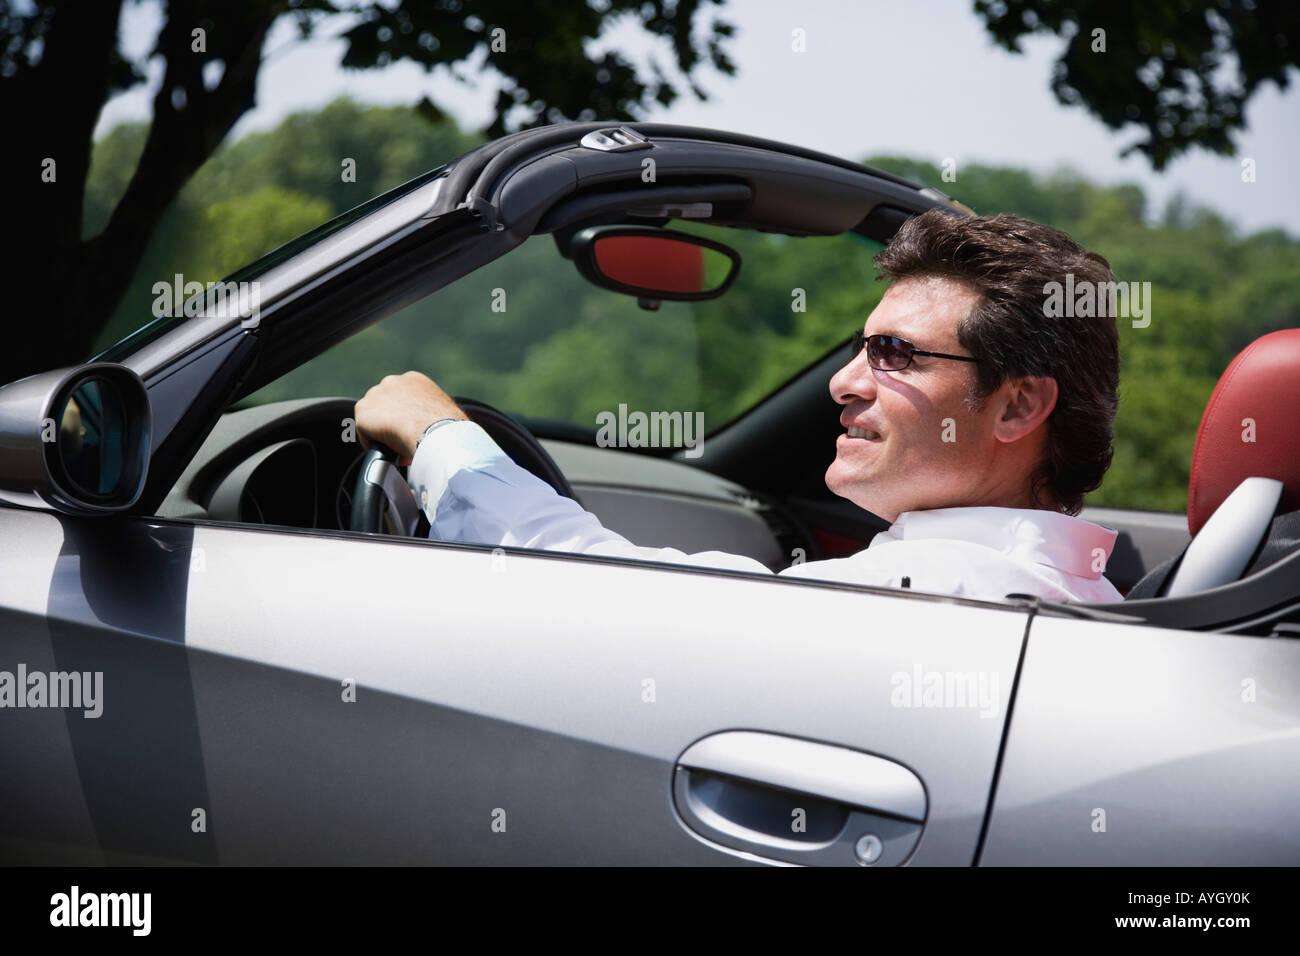 Man driving convertible car - Stock Image